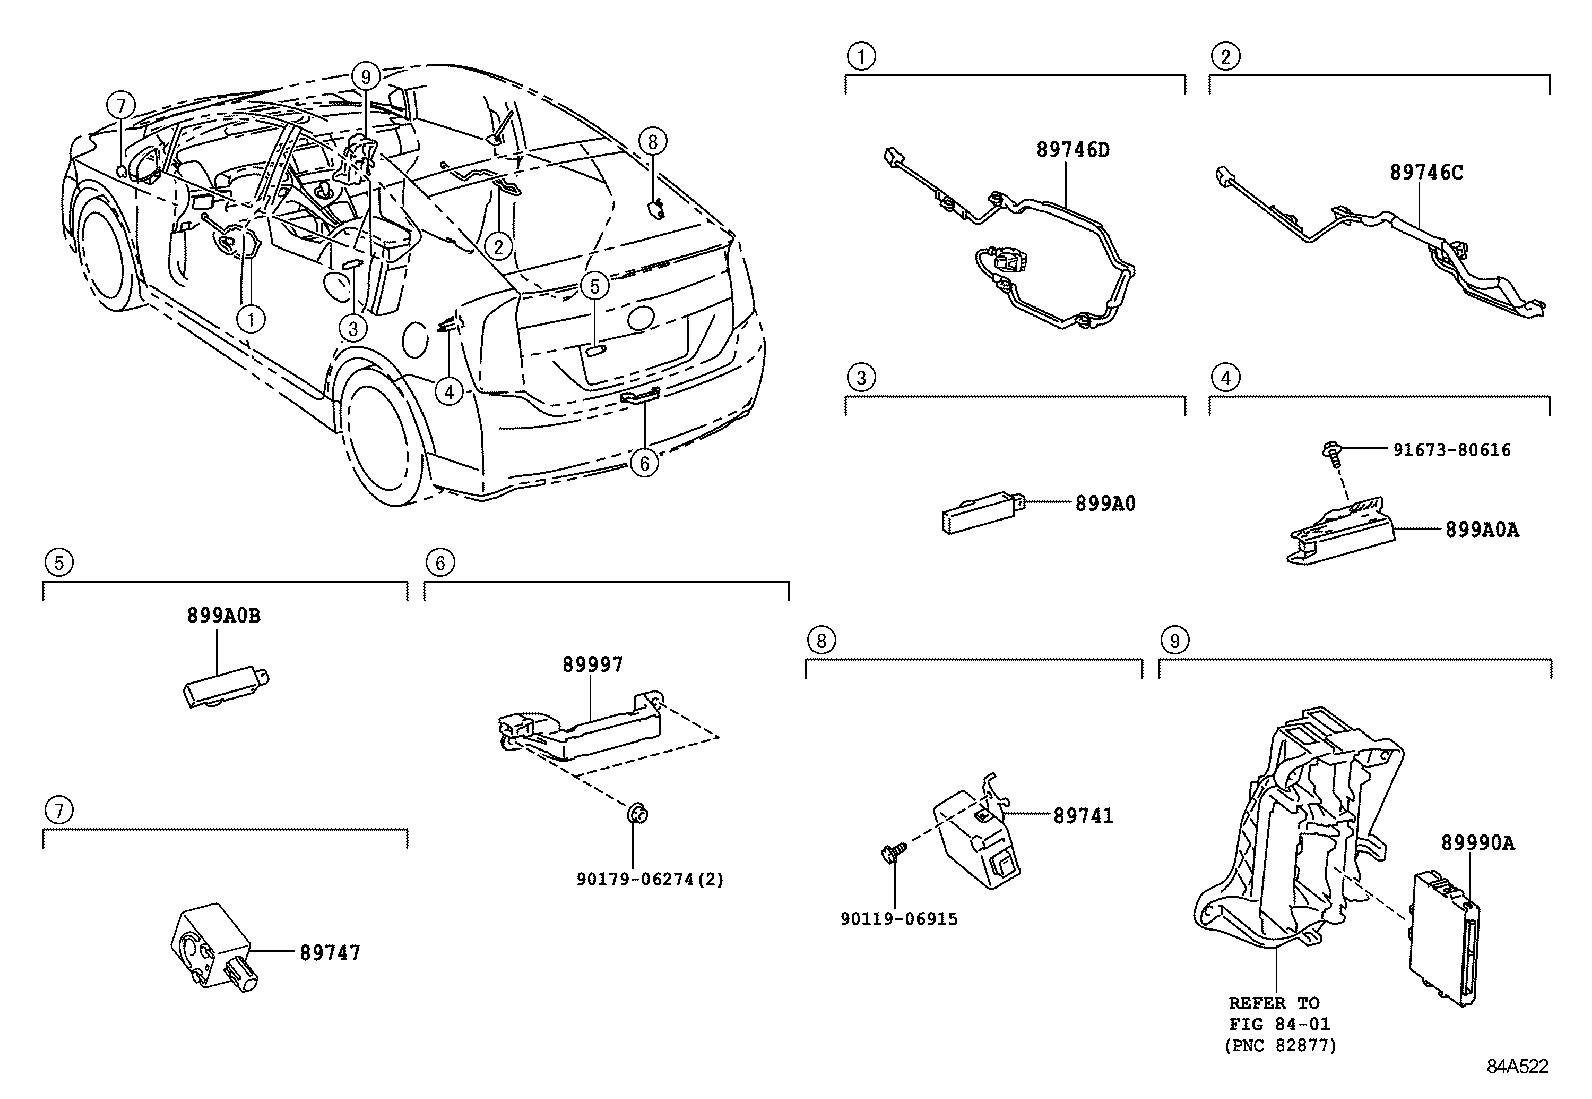 toyota priuszvw30l-ahxebw - electrical